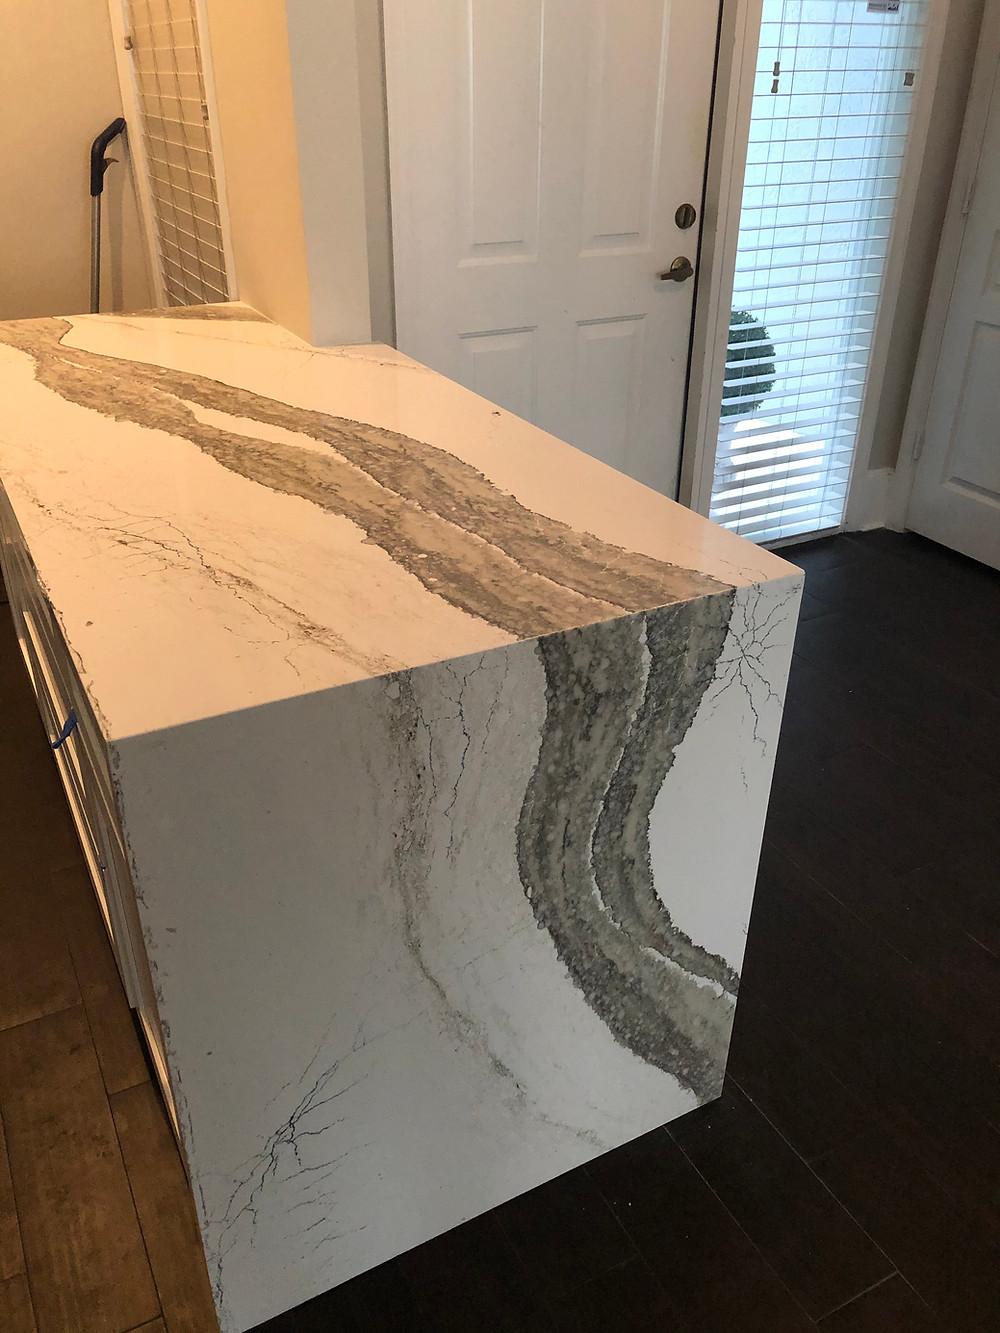 Contact Stone and Quartz LLC, for Cambria Skara Brave or any other Cambria quartz countertops.